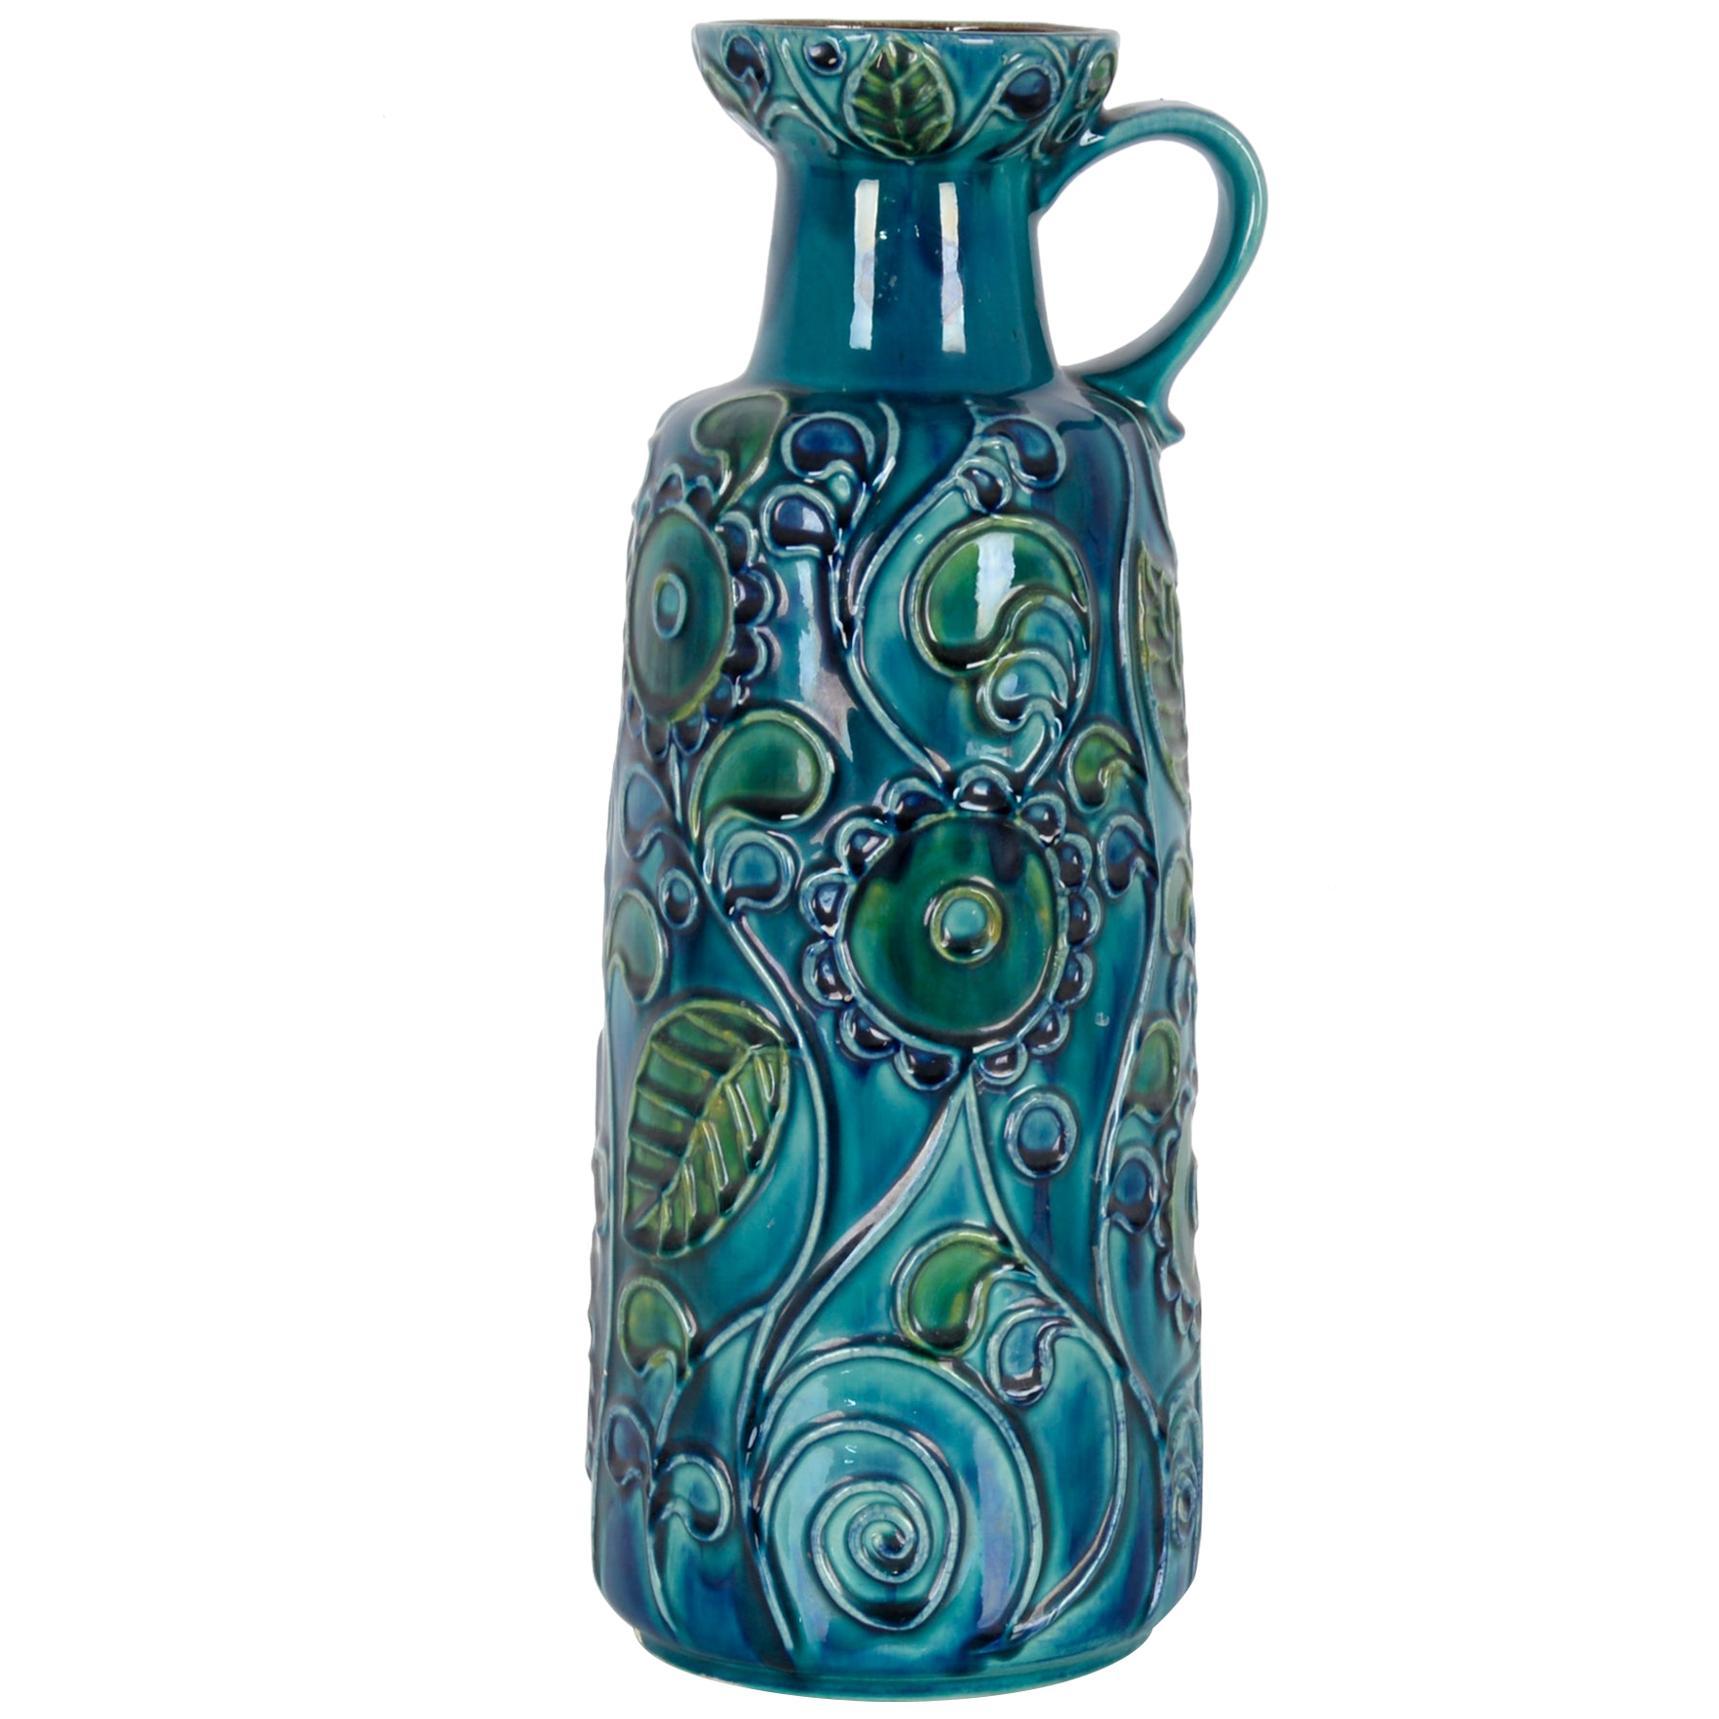 1950s West German Bay Keramik Blue Ceramic Vase